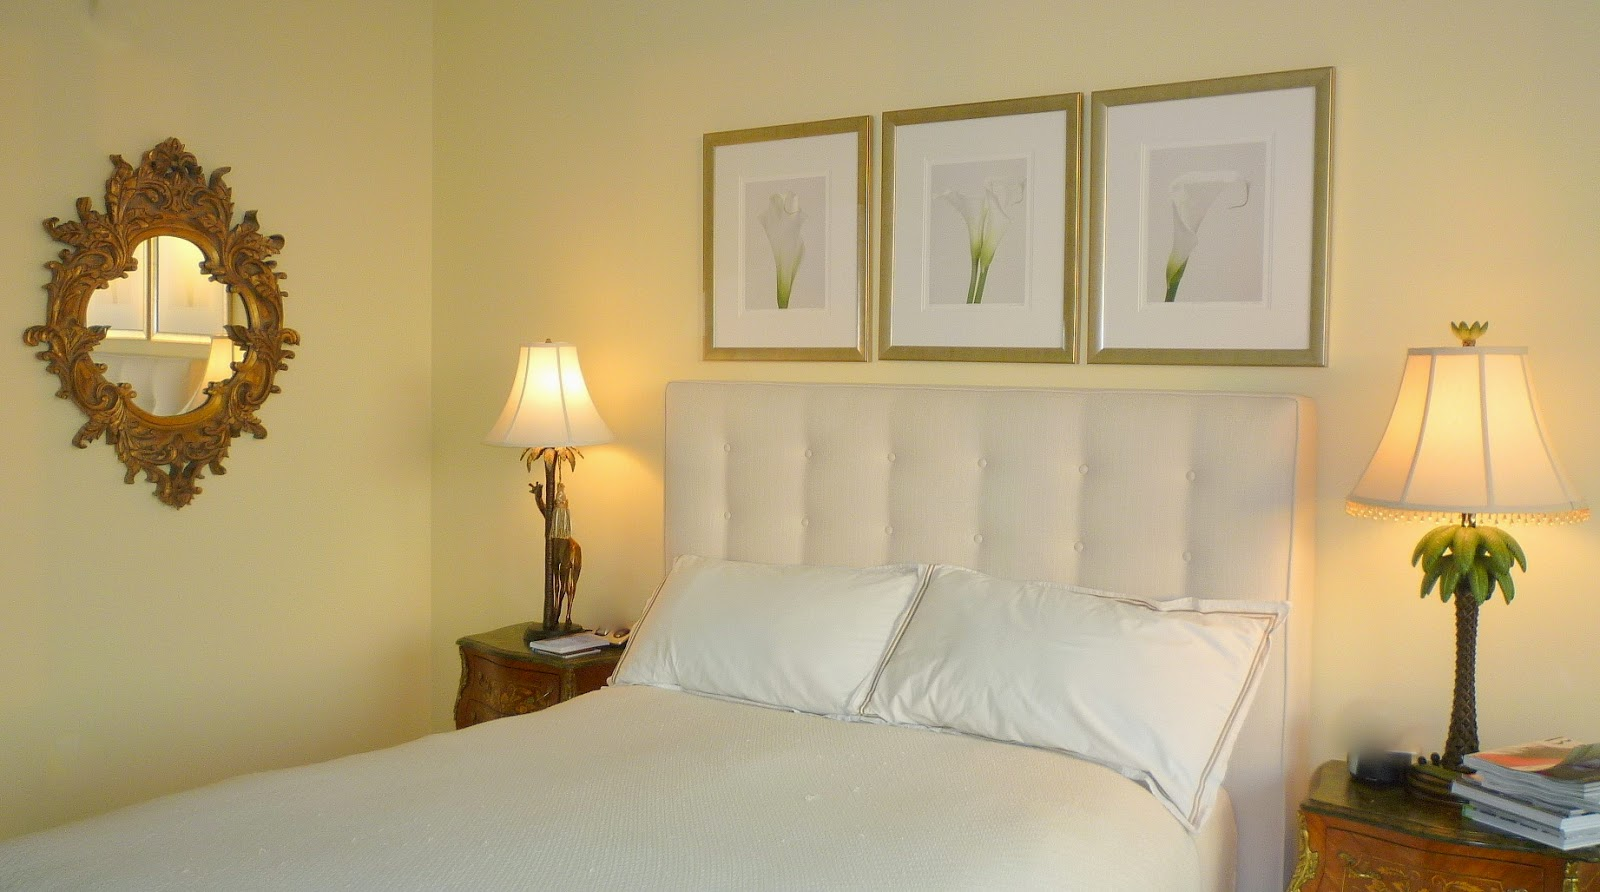 New Bedroom Baroquemirror Image Robin